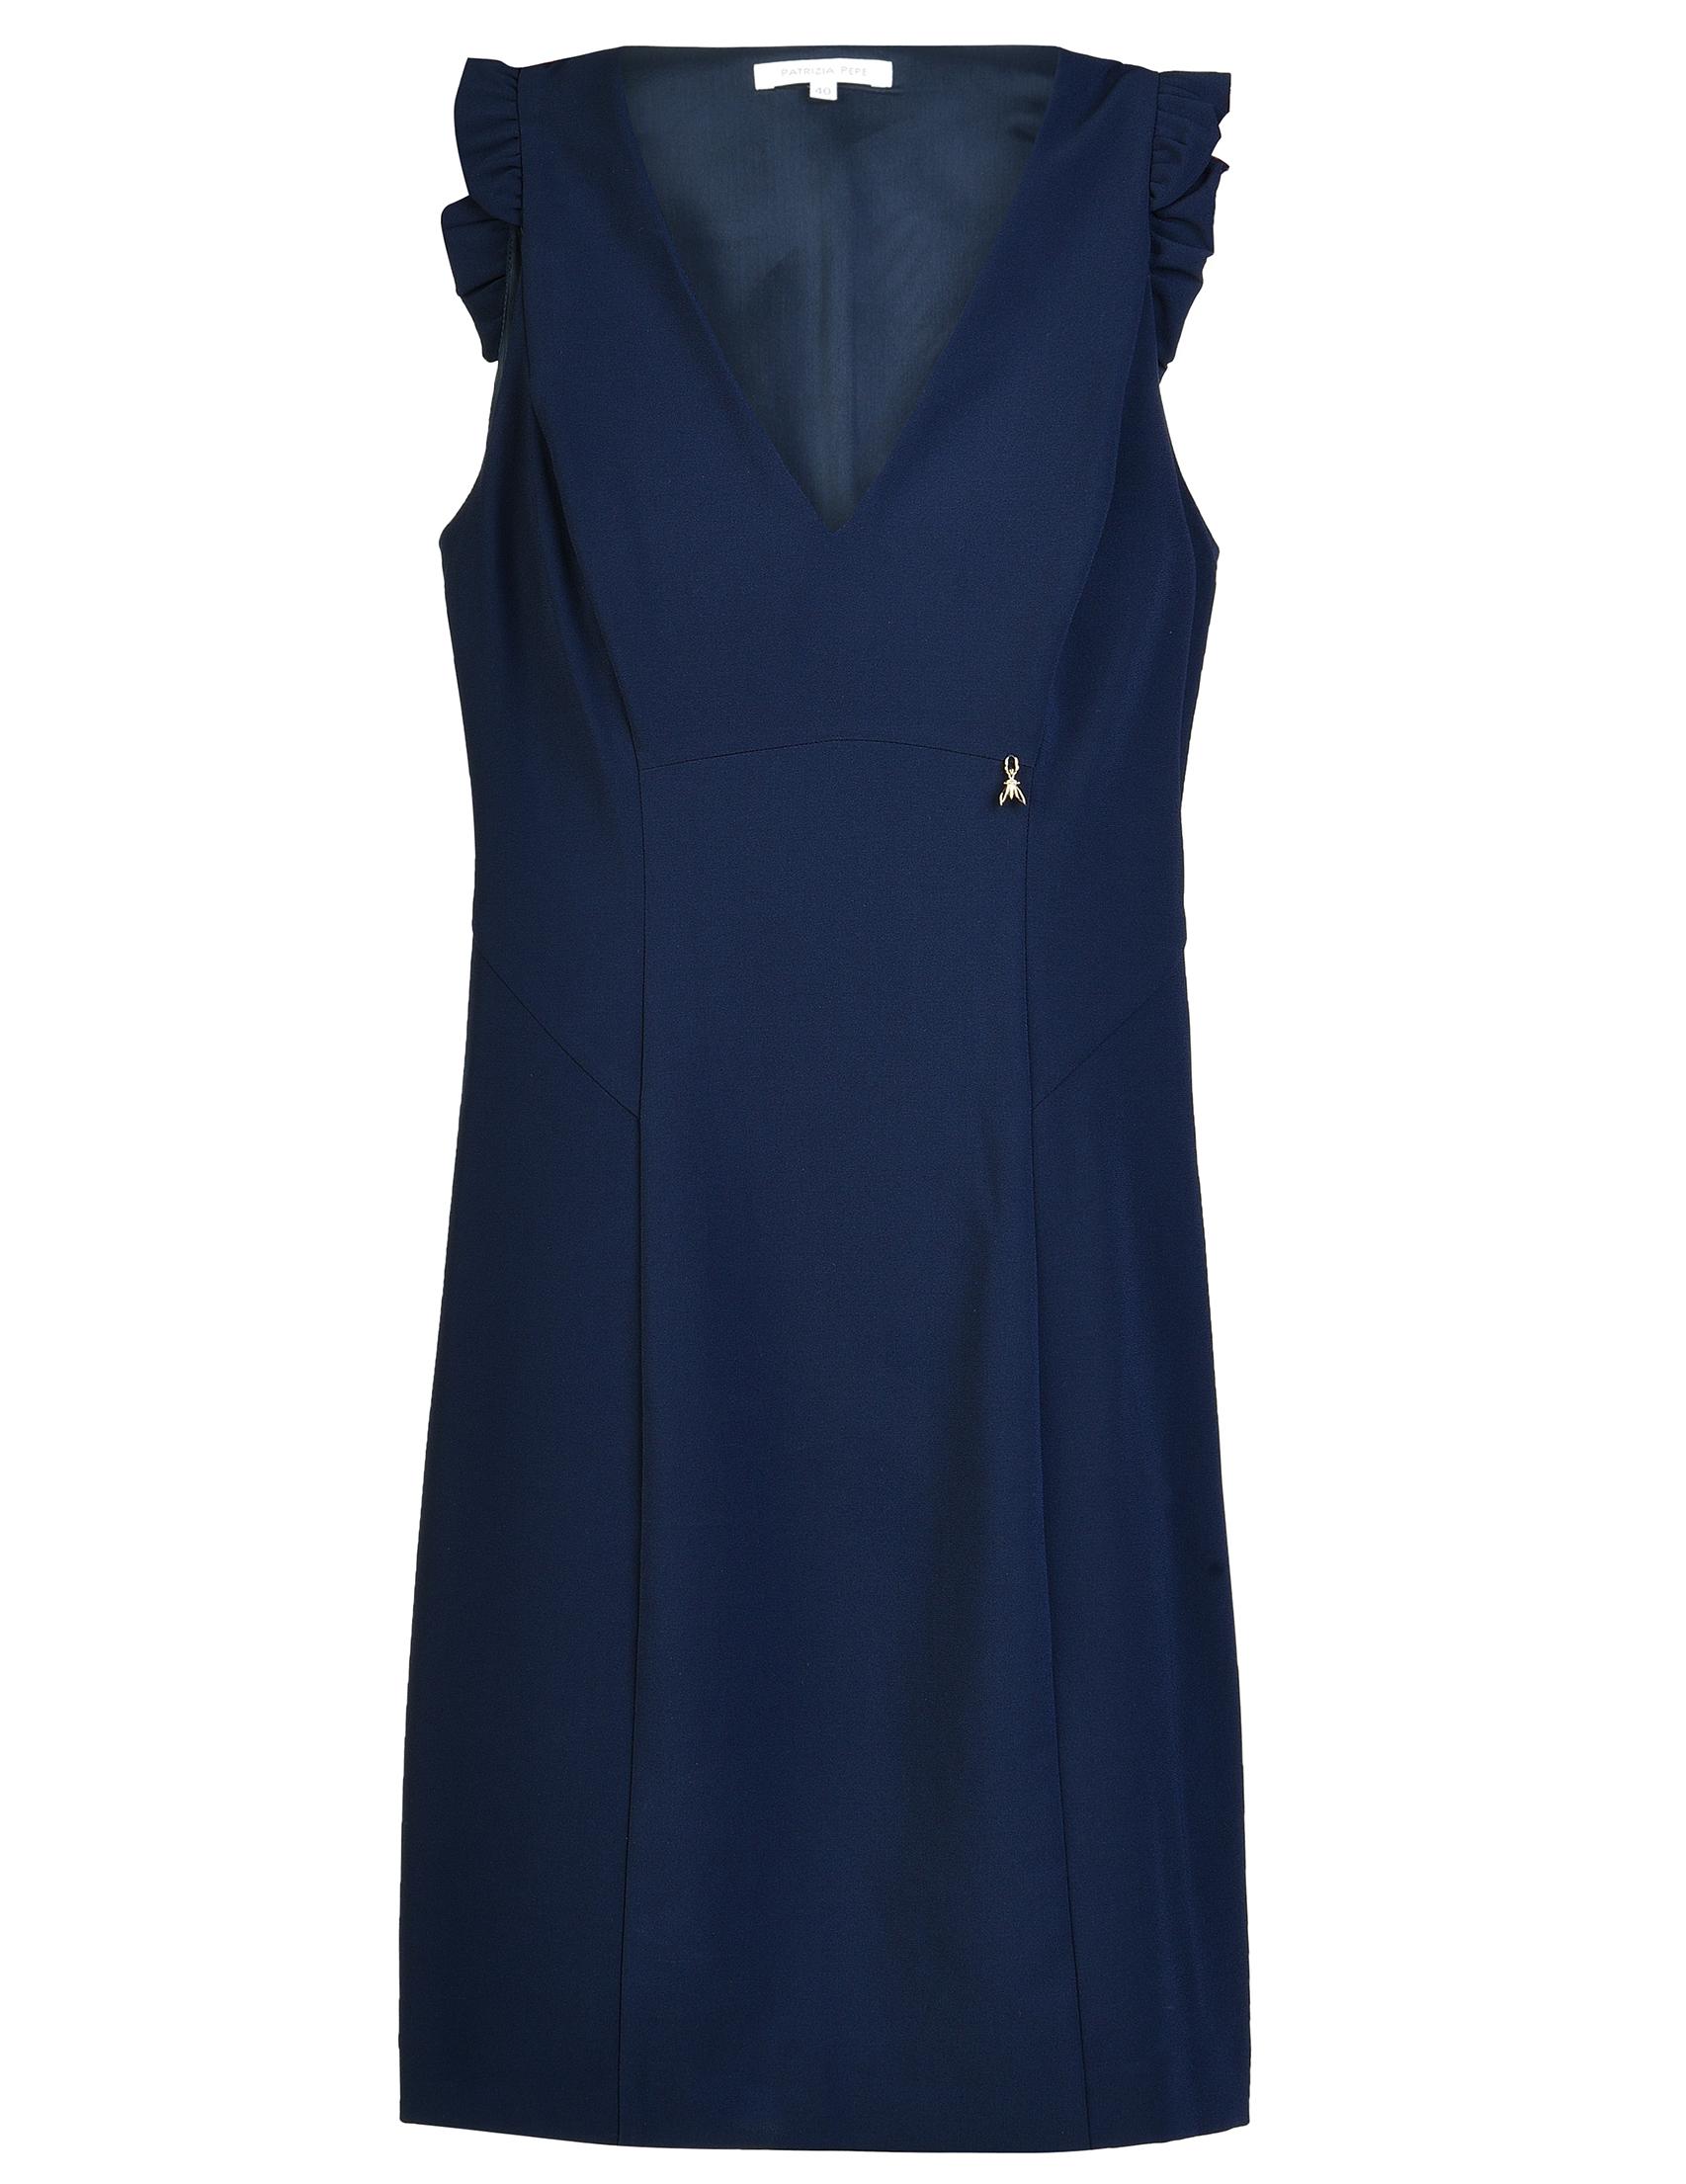 Купить Платье, PATRIZIA PEPE, Синий, 12%Эластан 88%Полиамид, Осень-Зима